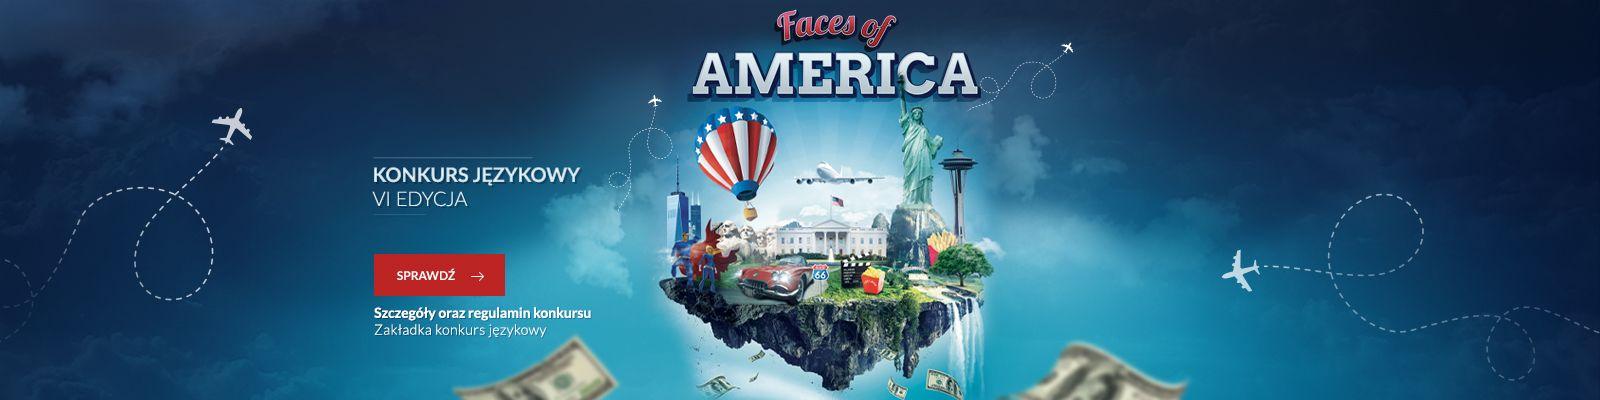 "Konkurs Językowy ""Faces of America"" 2020"